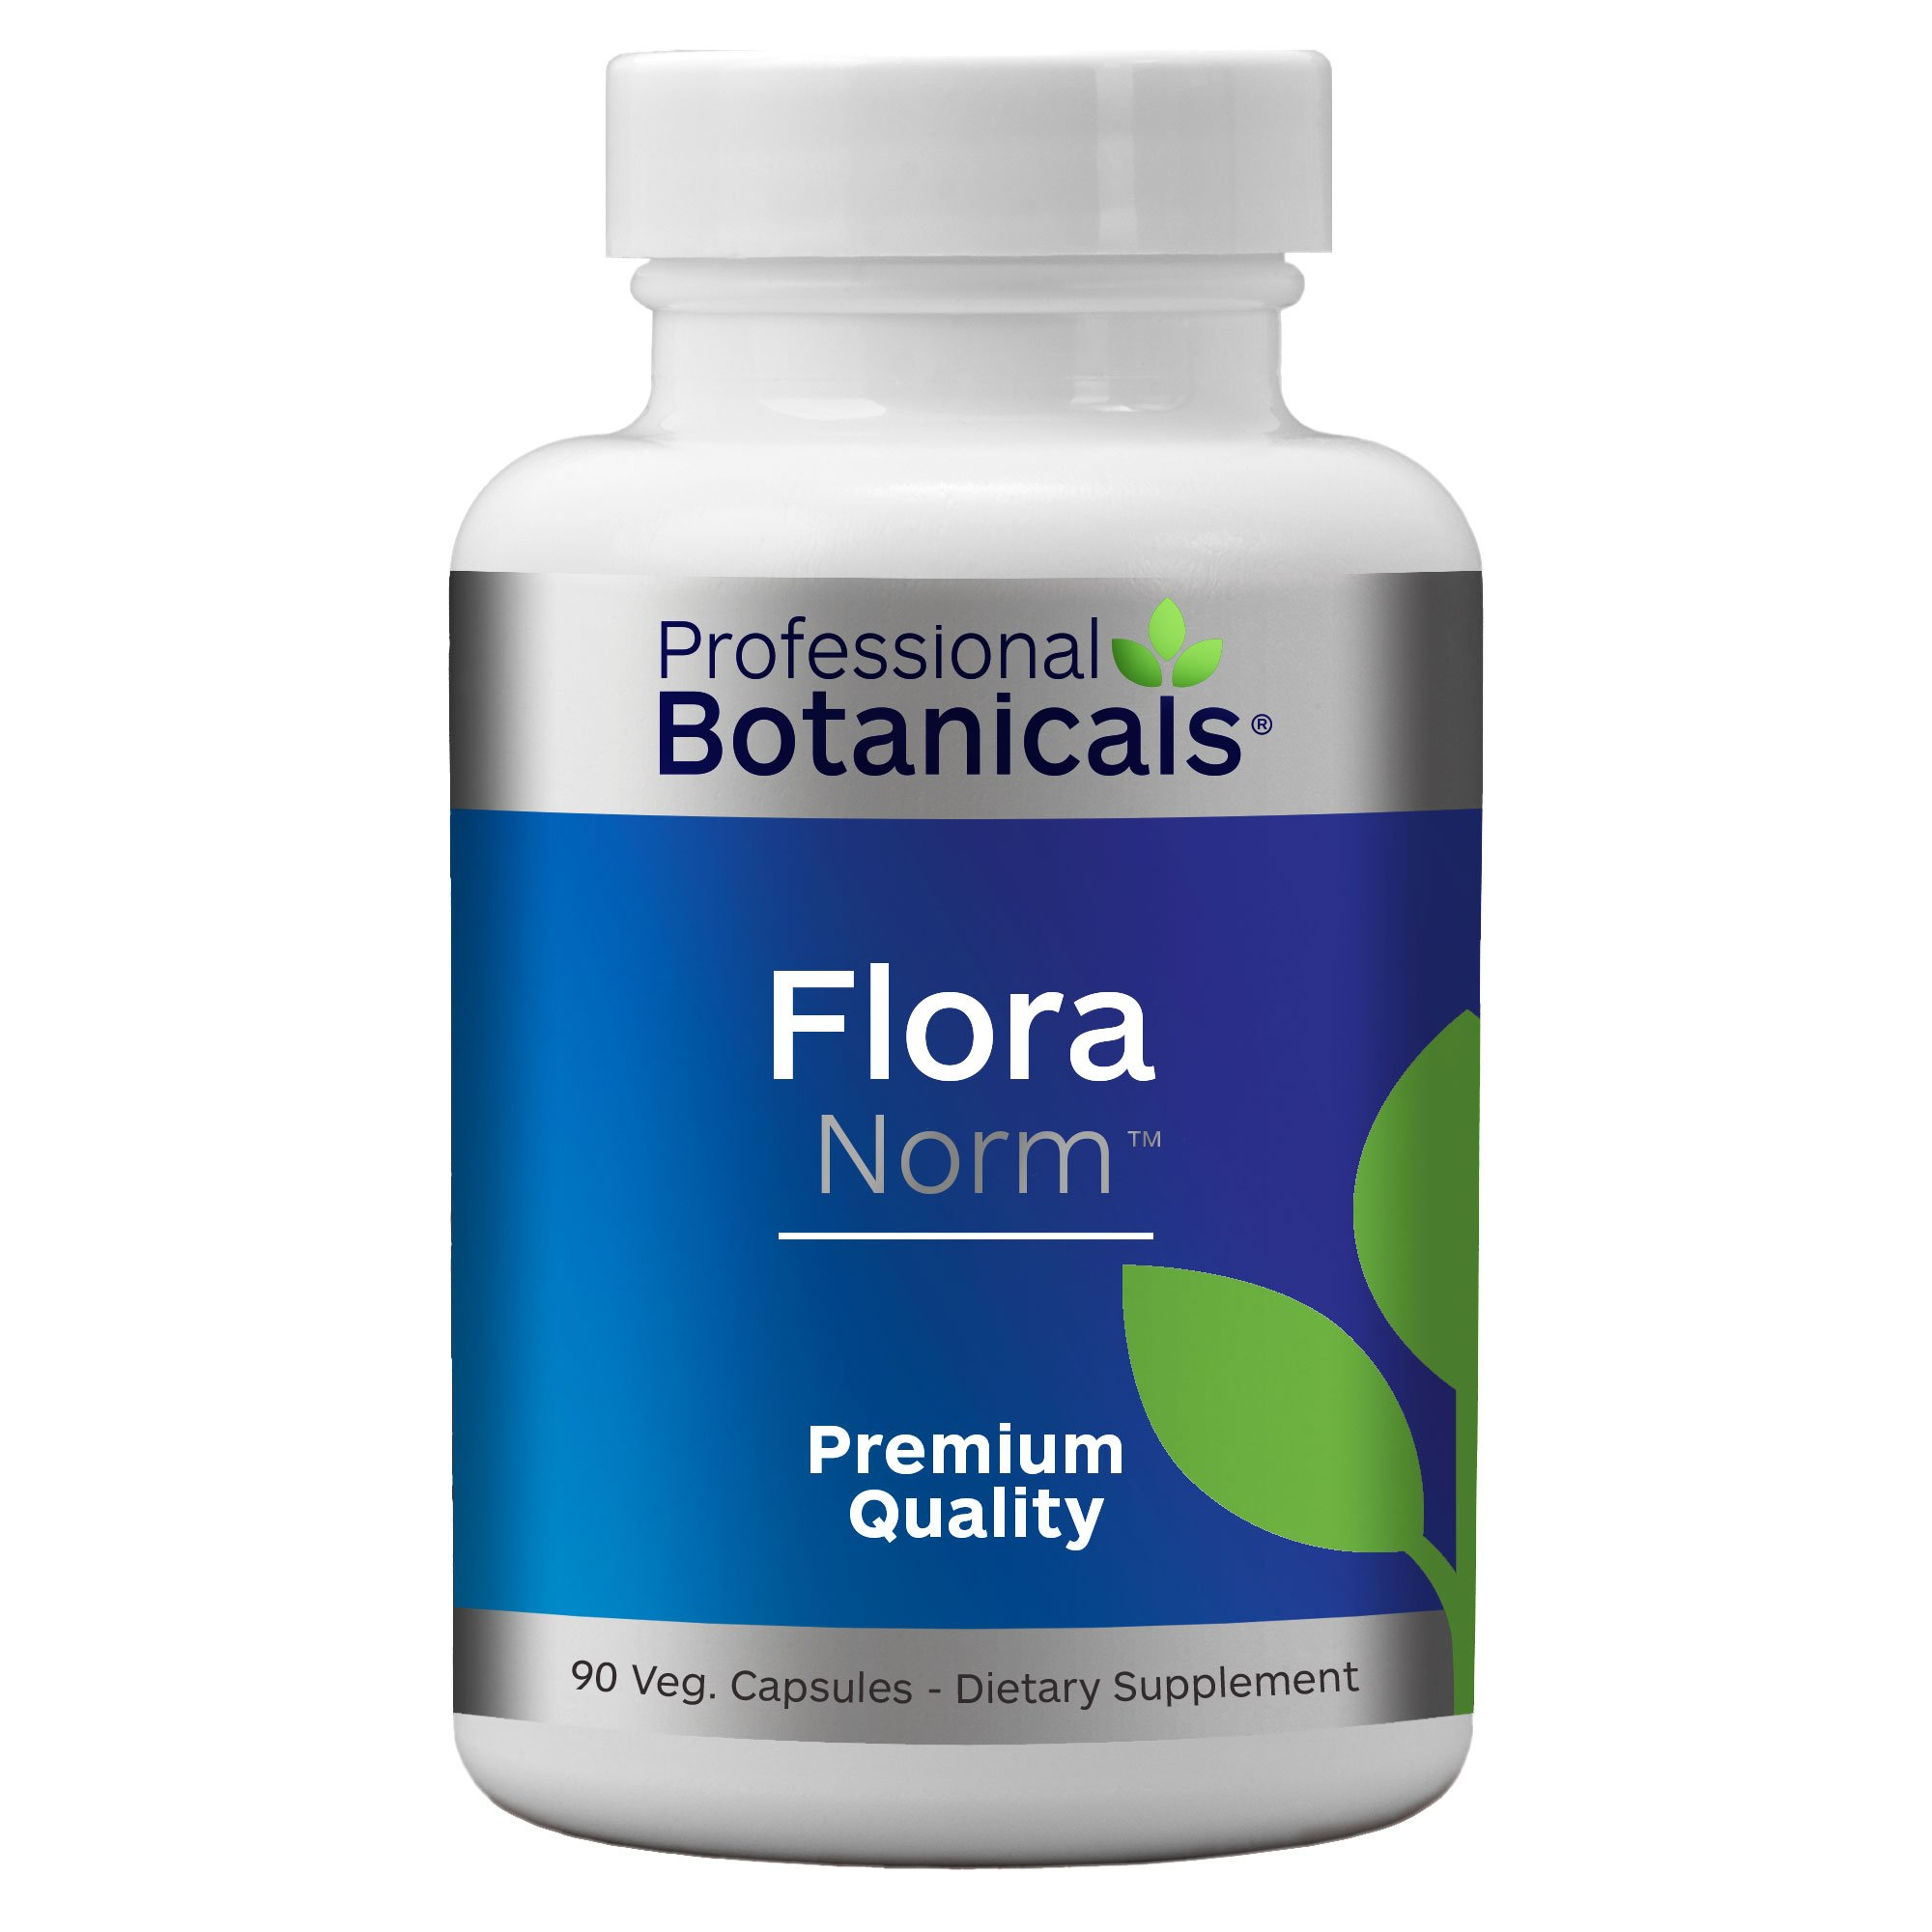 Professional Botanicals Flora Norm - 12-Strain Potent Vegan Probiotic Mix (10 Billion CFU/gm.) Supports Digestive and Immune Health 90 Vegetarian Capsules